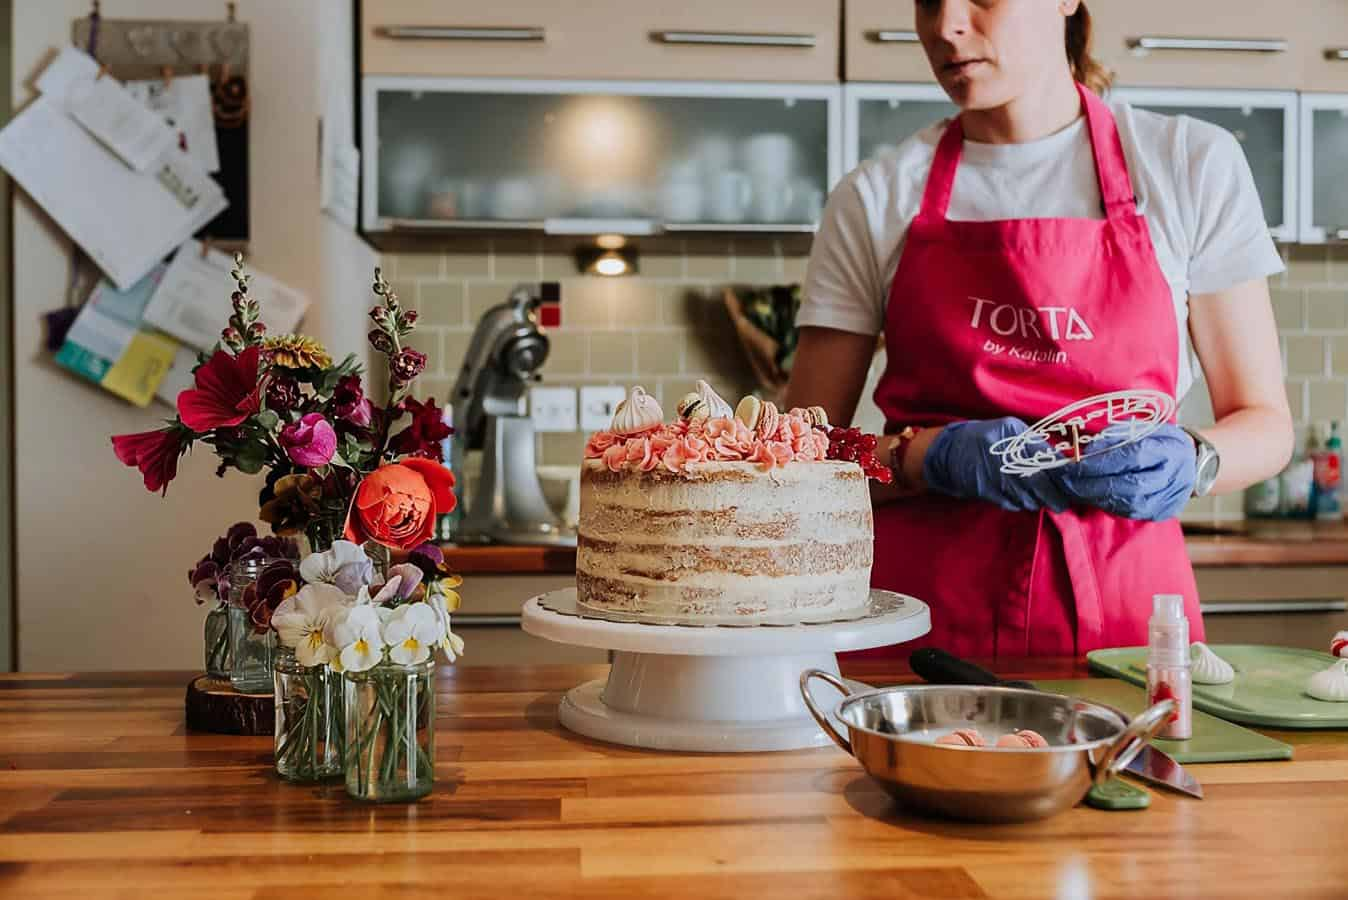 Torta by Katalin